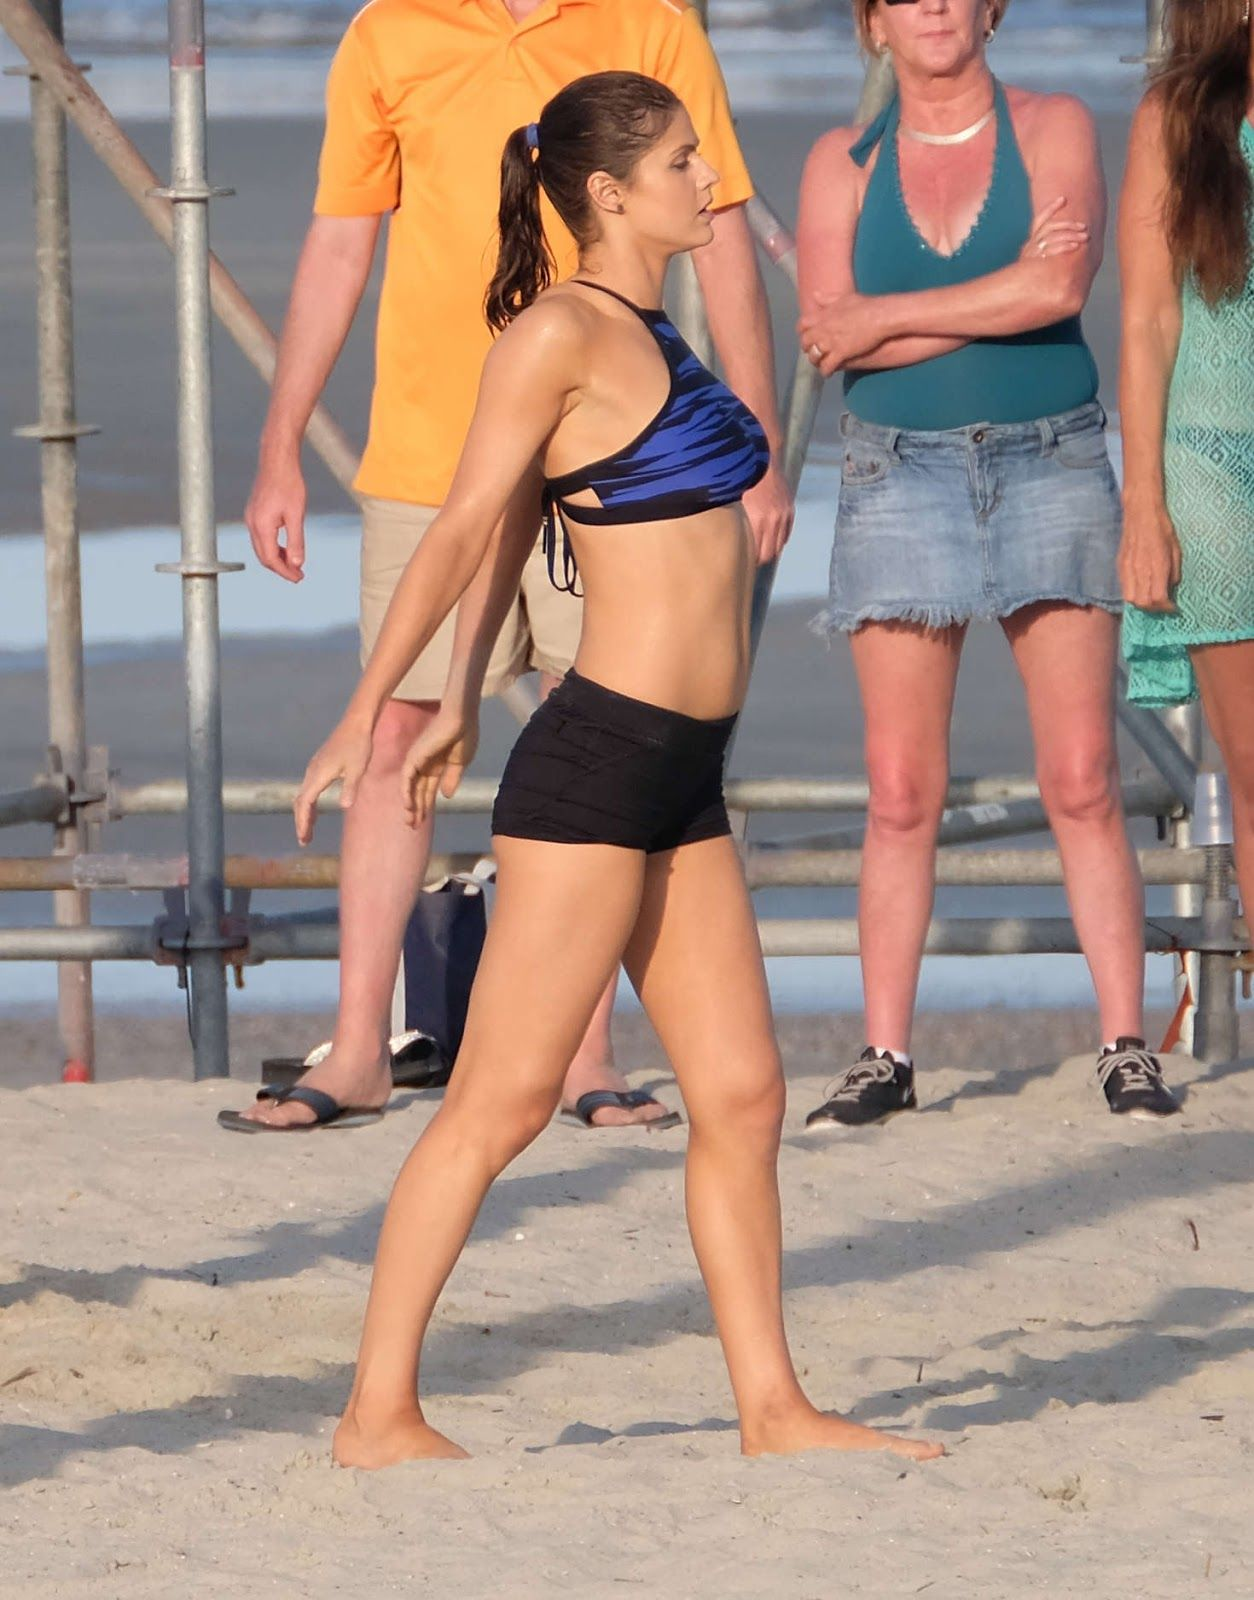 Alexandra Daddario Filming Scenes For Baywatch In